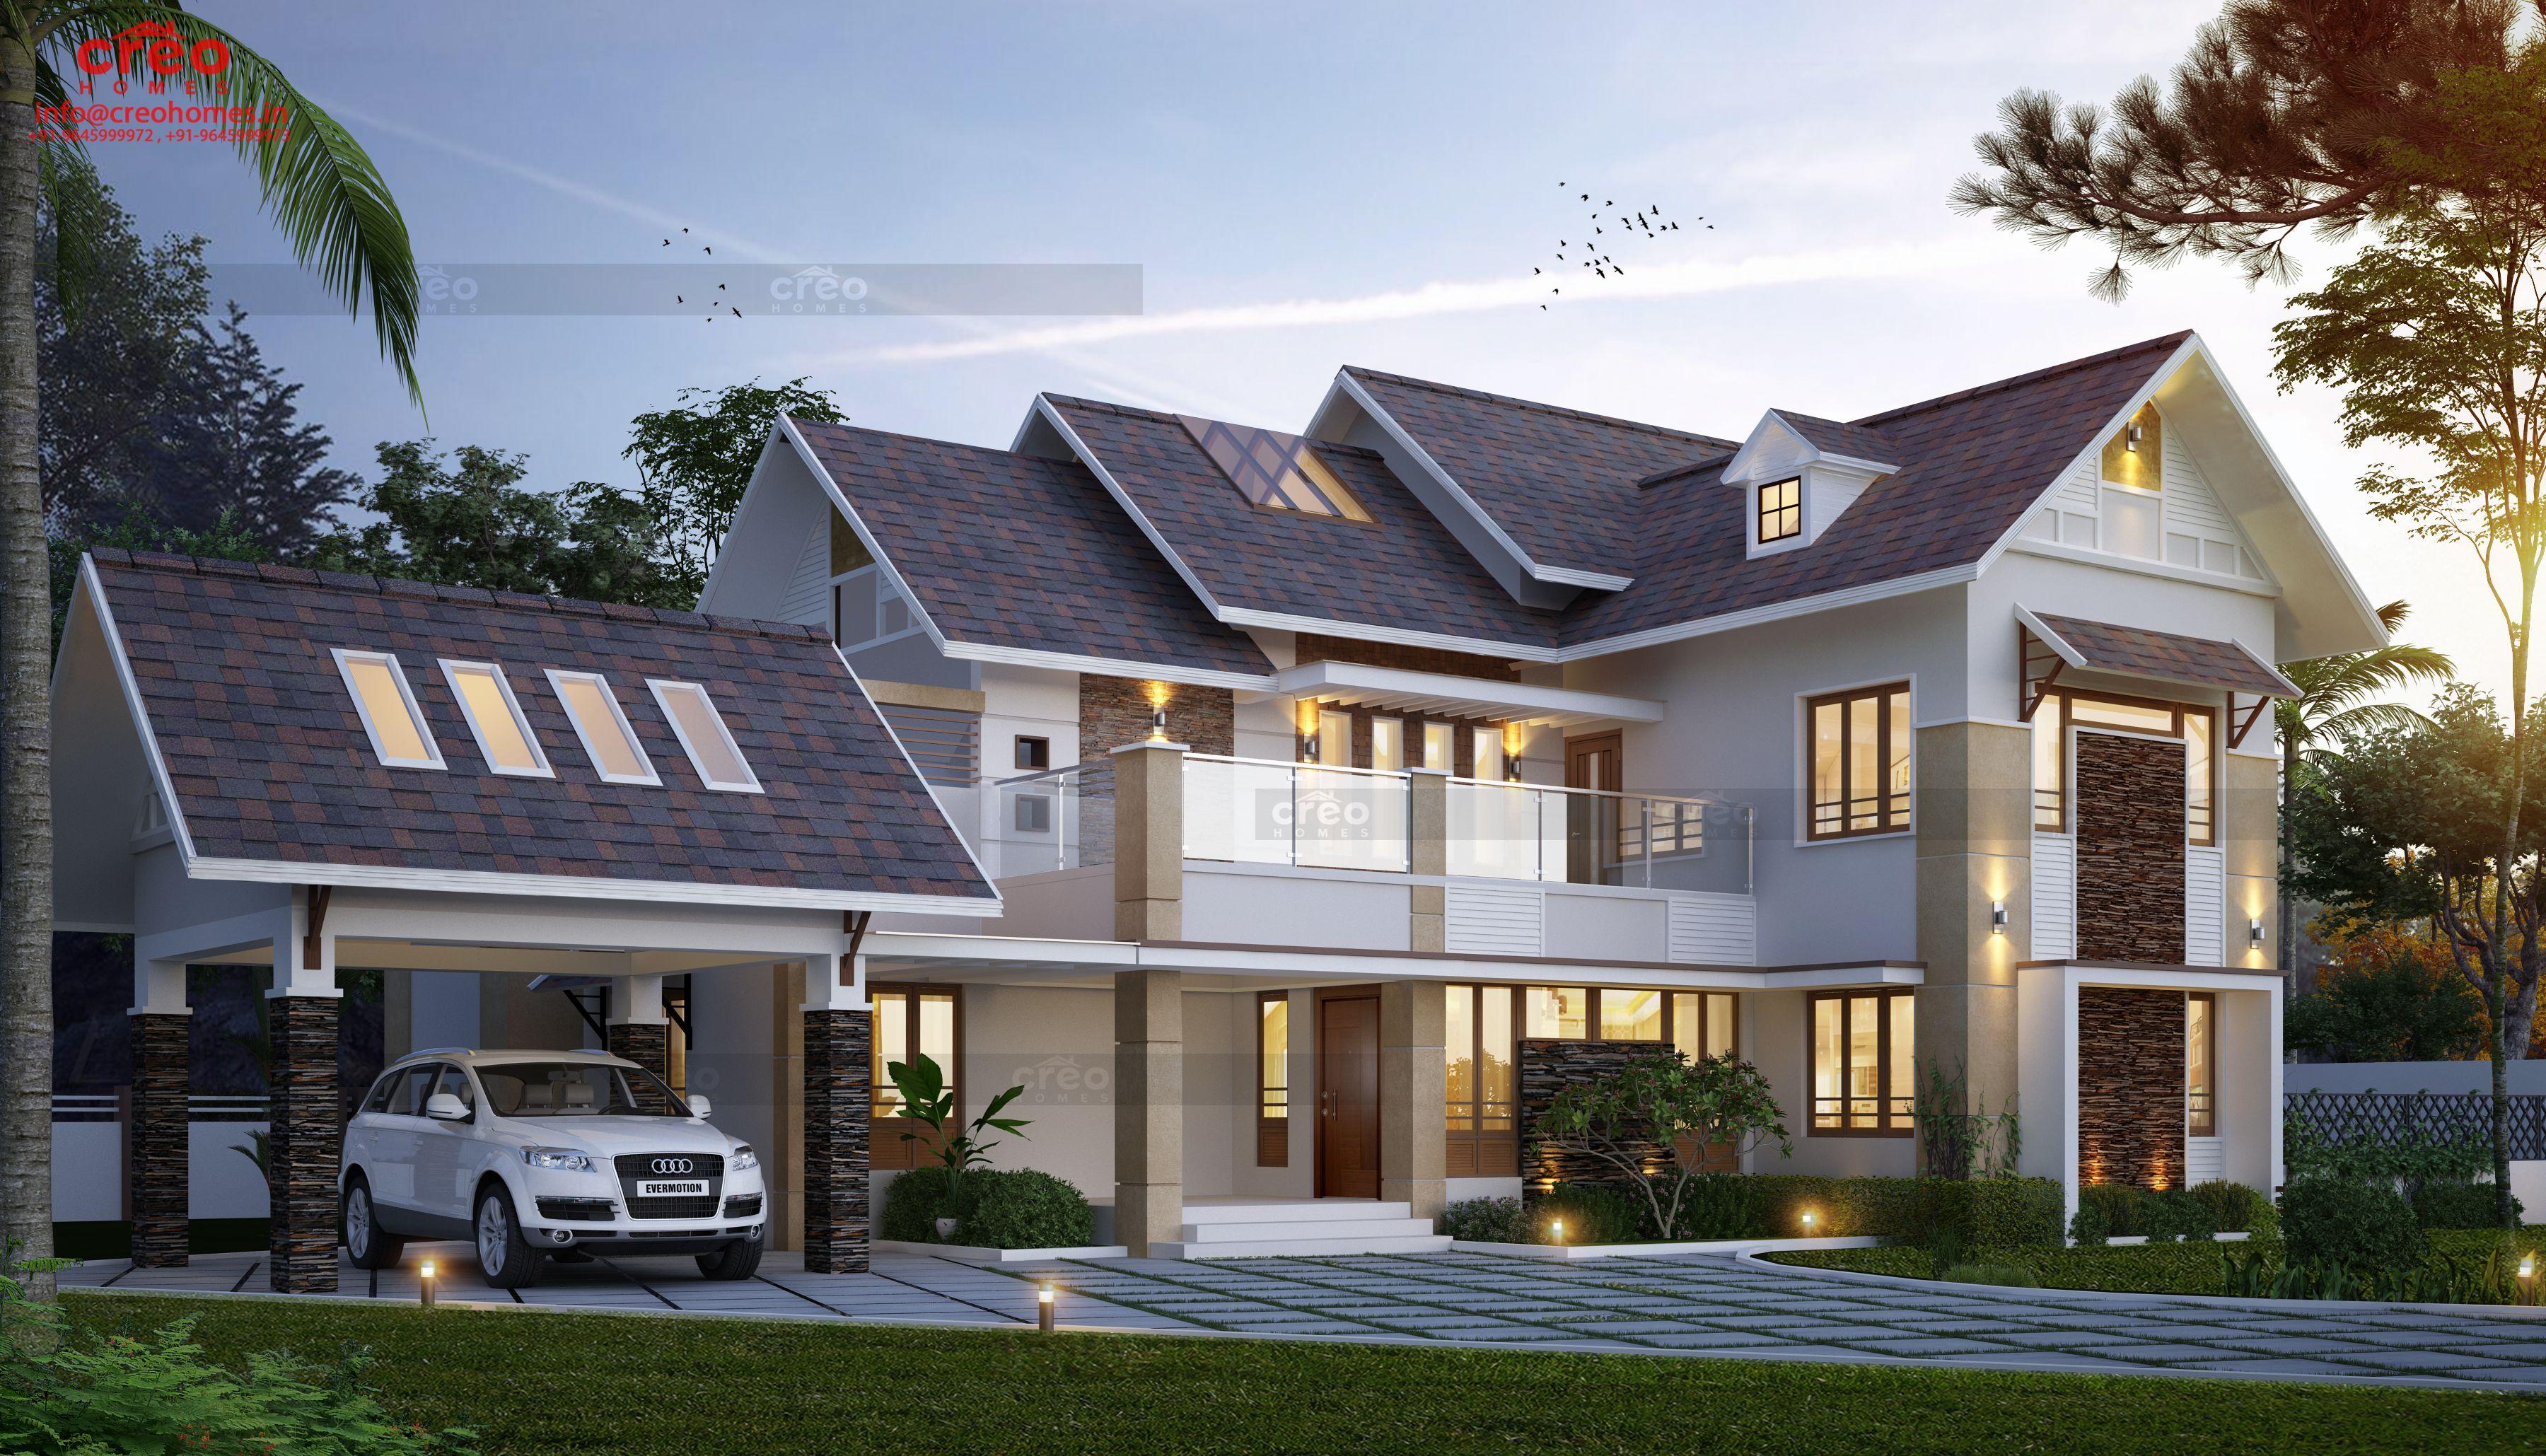 D'life home interiors - kottayam kottayam kerala creohomes has been a leading architectural and interior designing